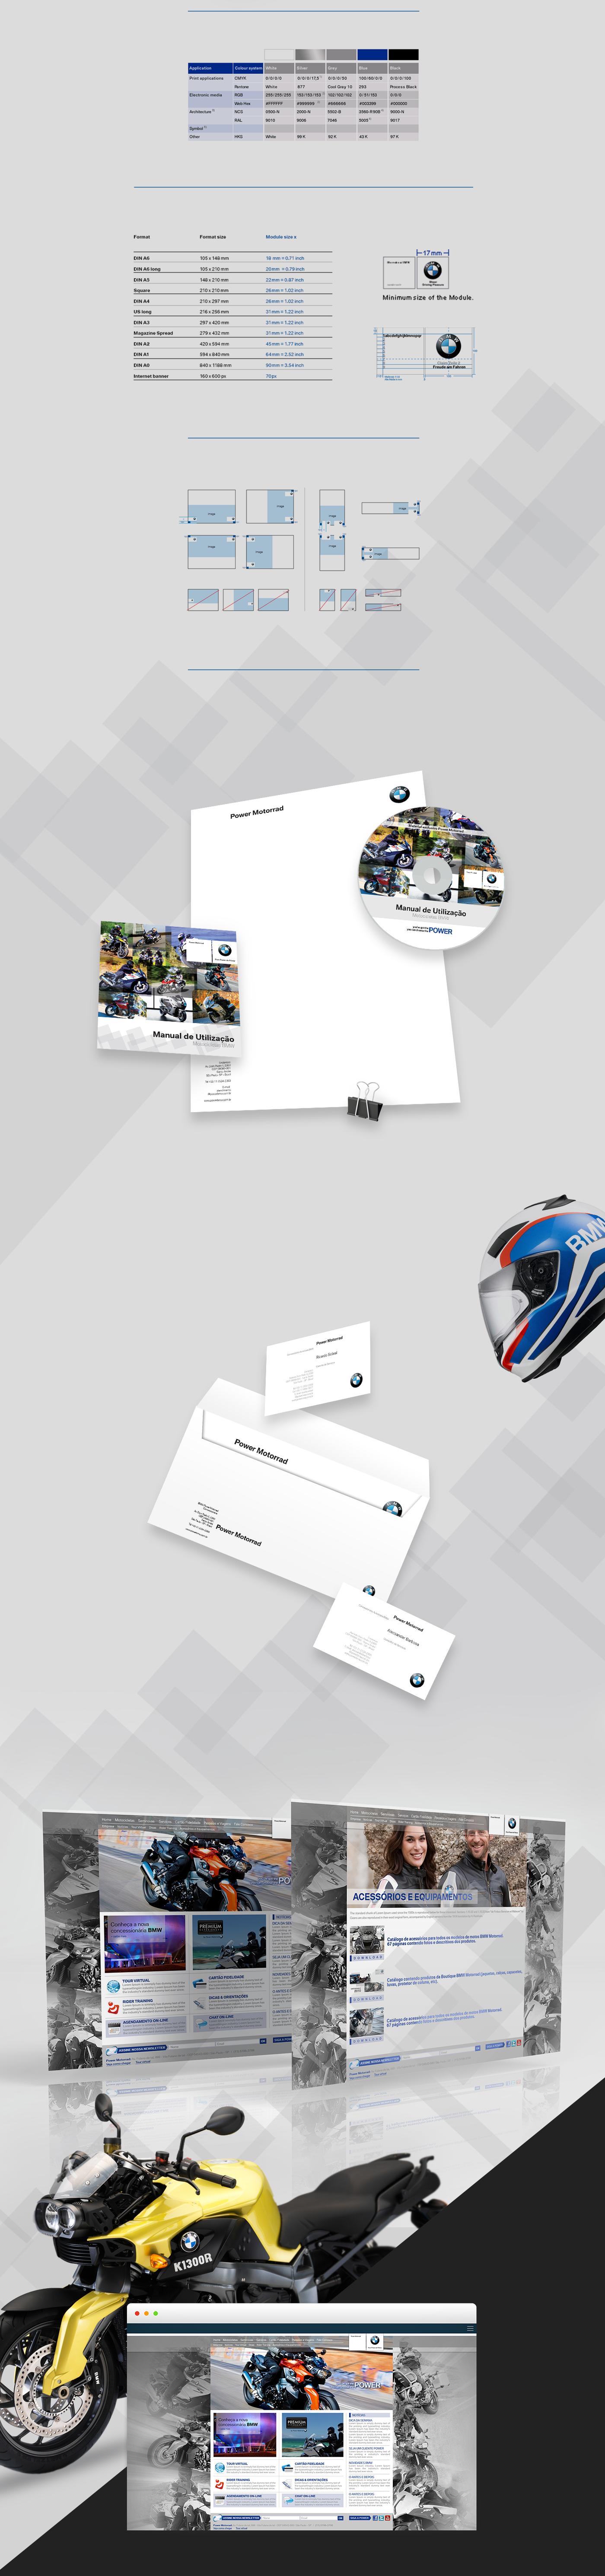 brand identity visual BMW power motorrad motorcycle branding